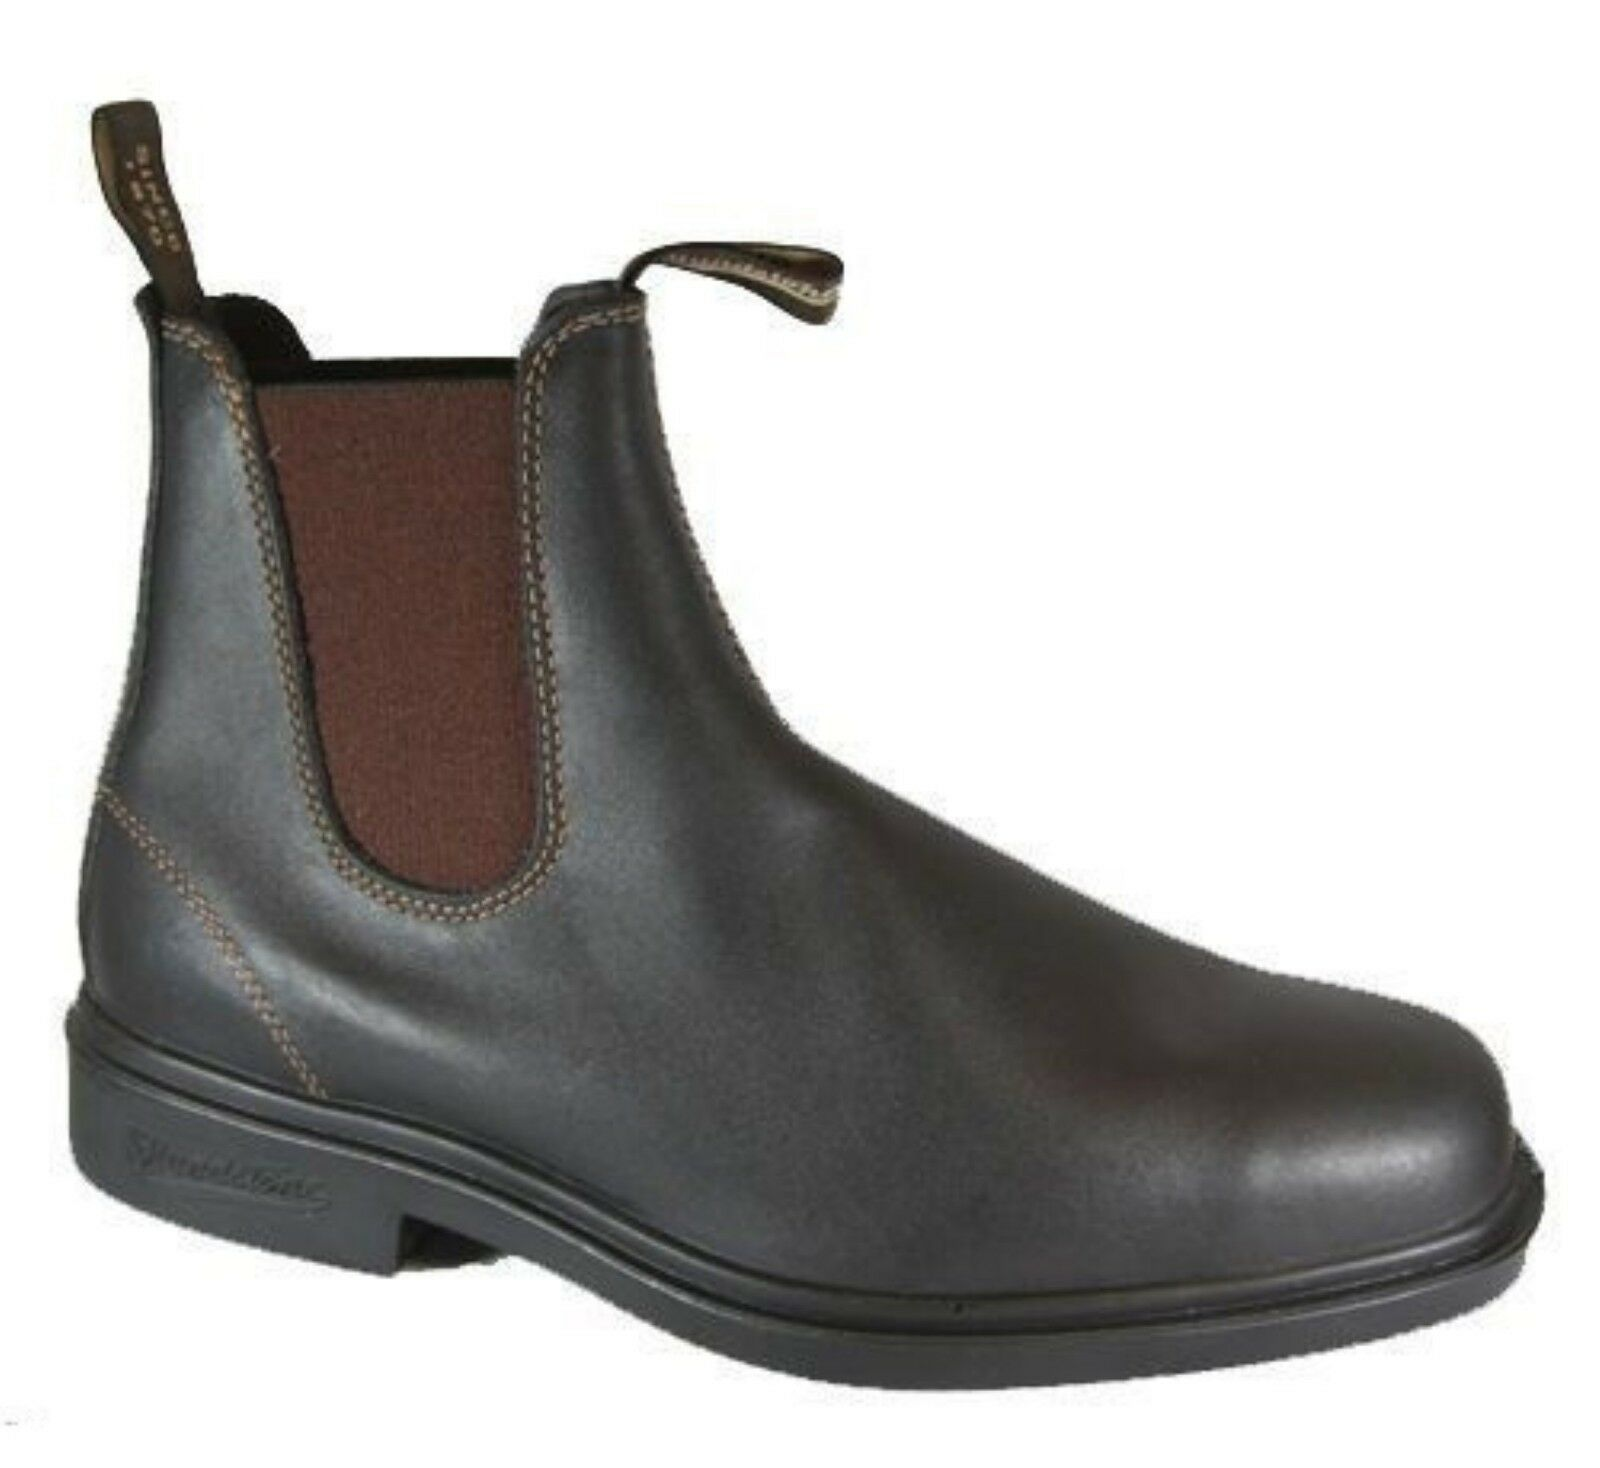 Blaundstone 062 Stout  braun braun braun Premium Leather Classic Stiefel Australia 07feb2